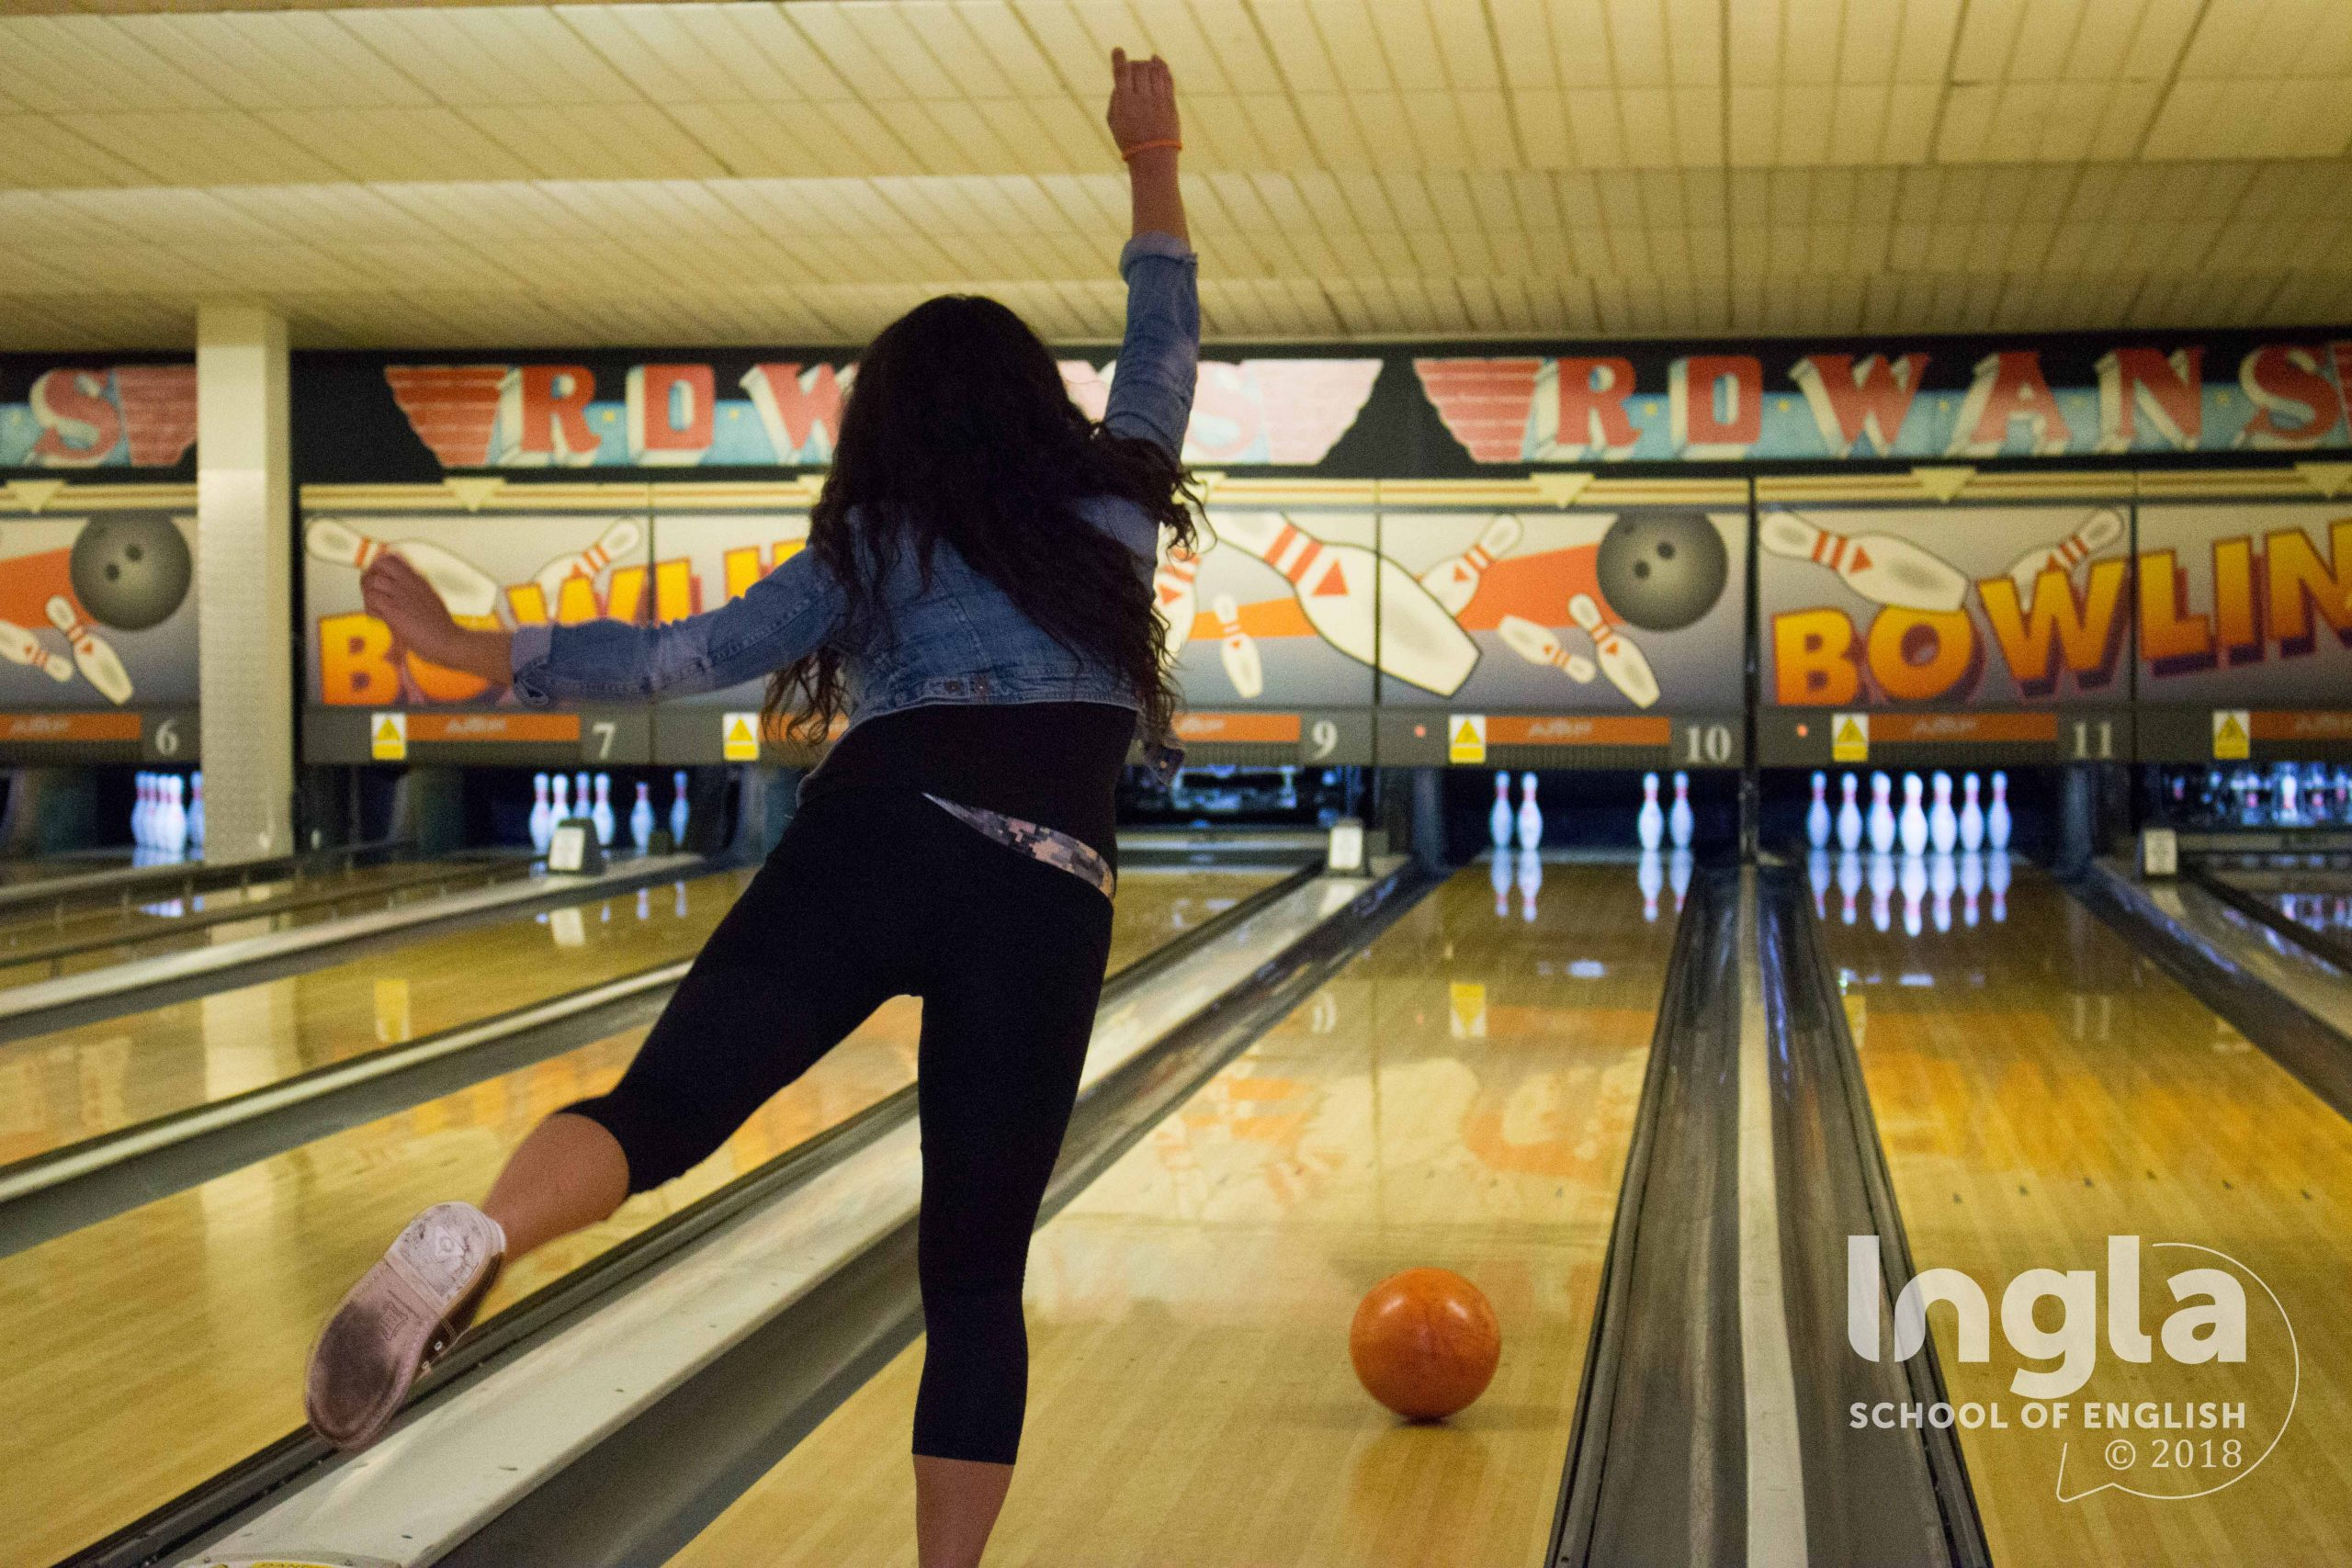 Ingla End-of-Term Bowling Night